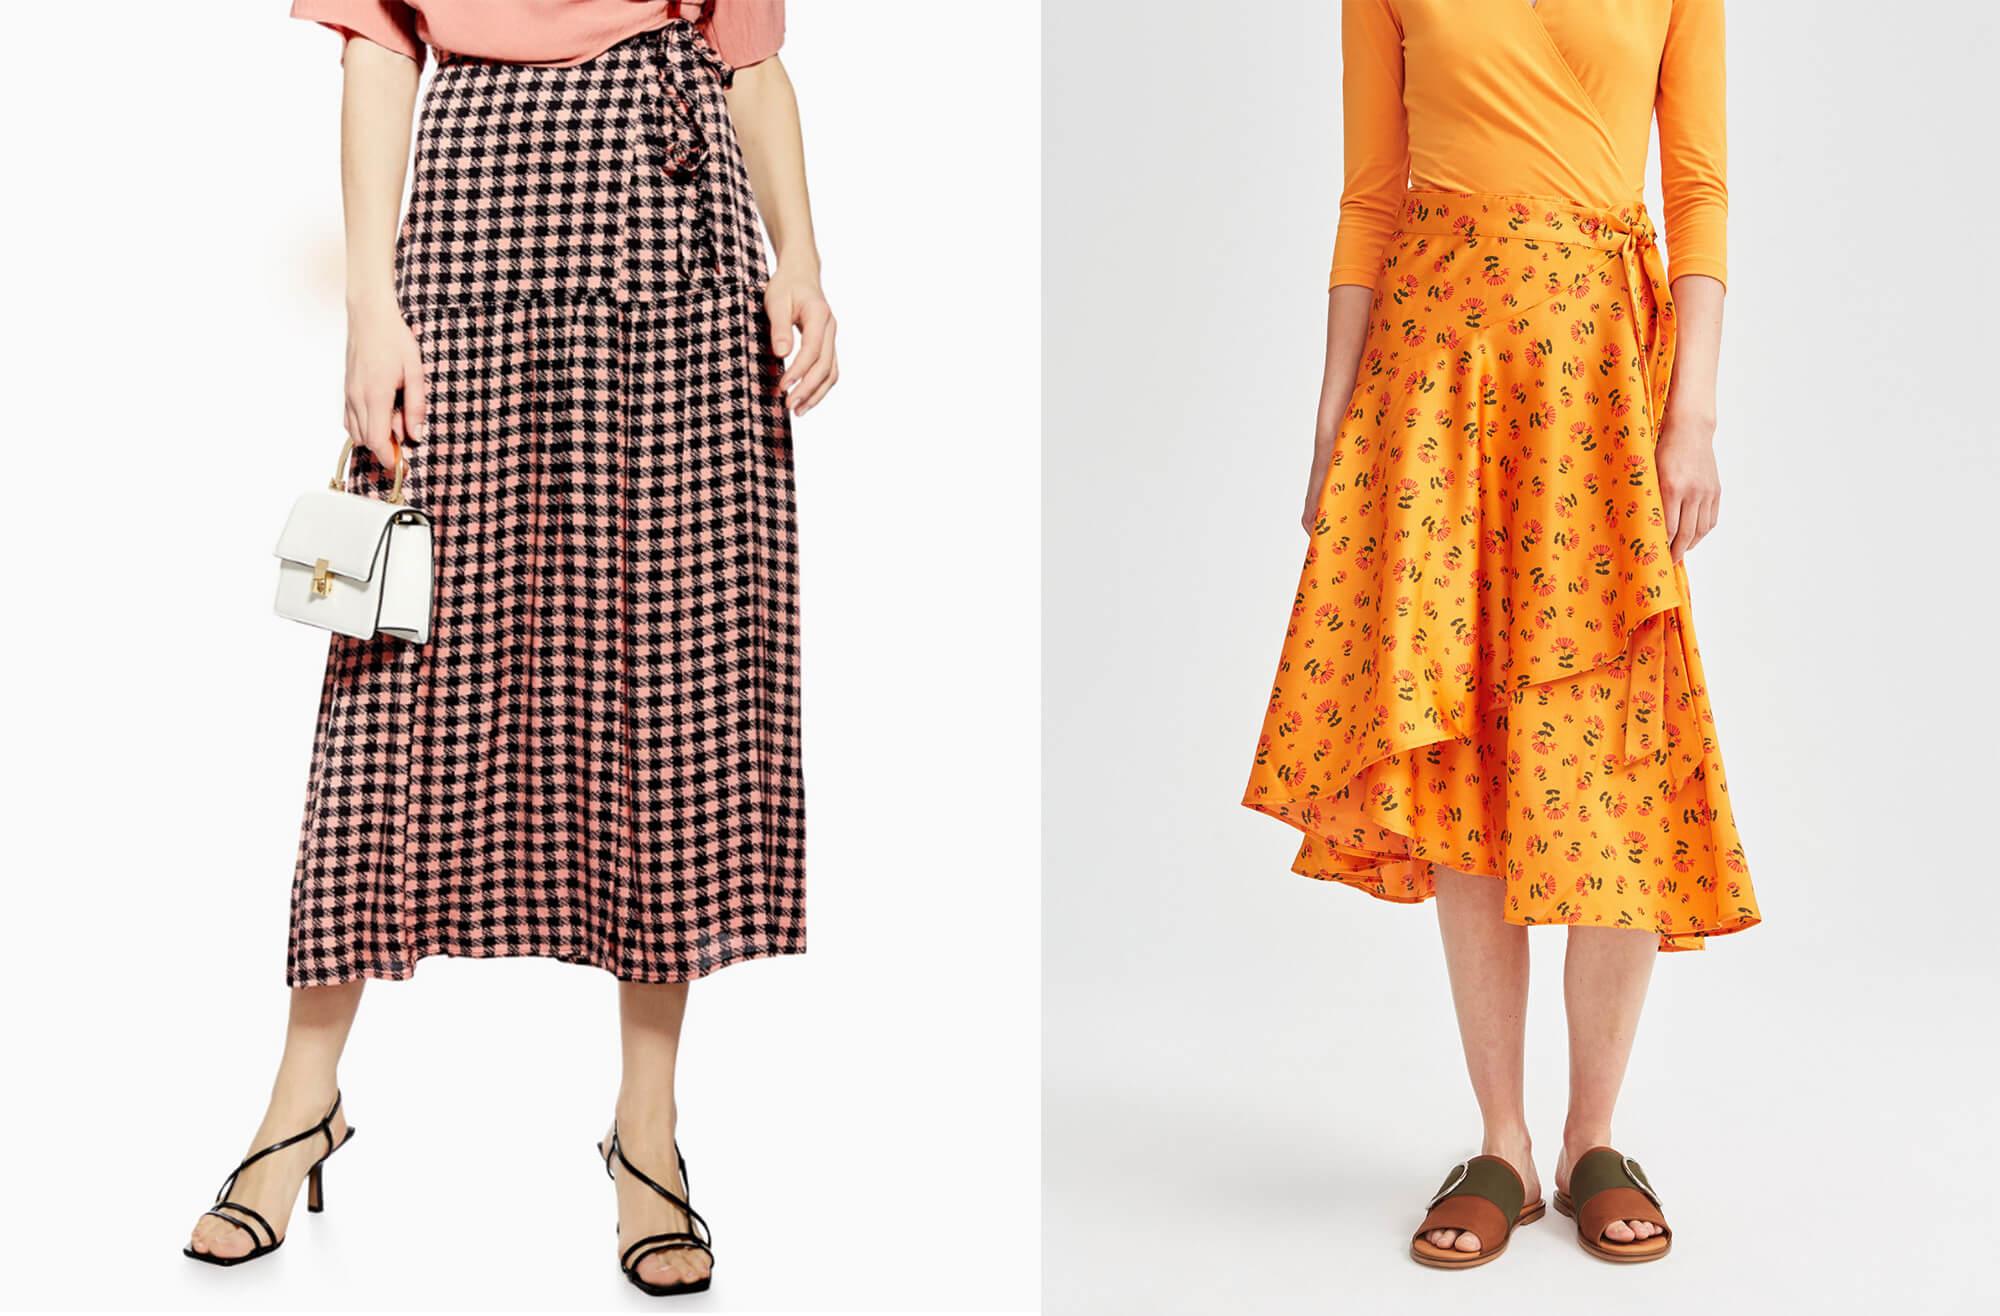 Snyggaste kjolarna i butik